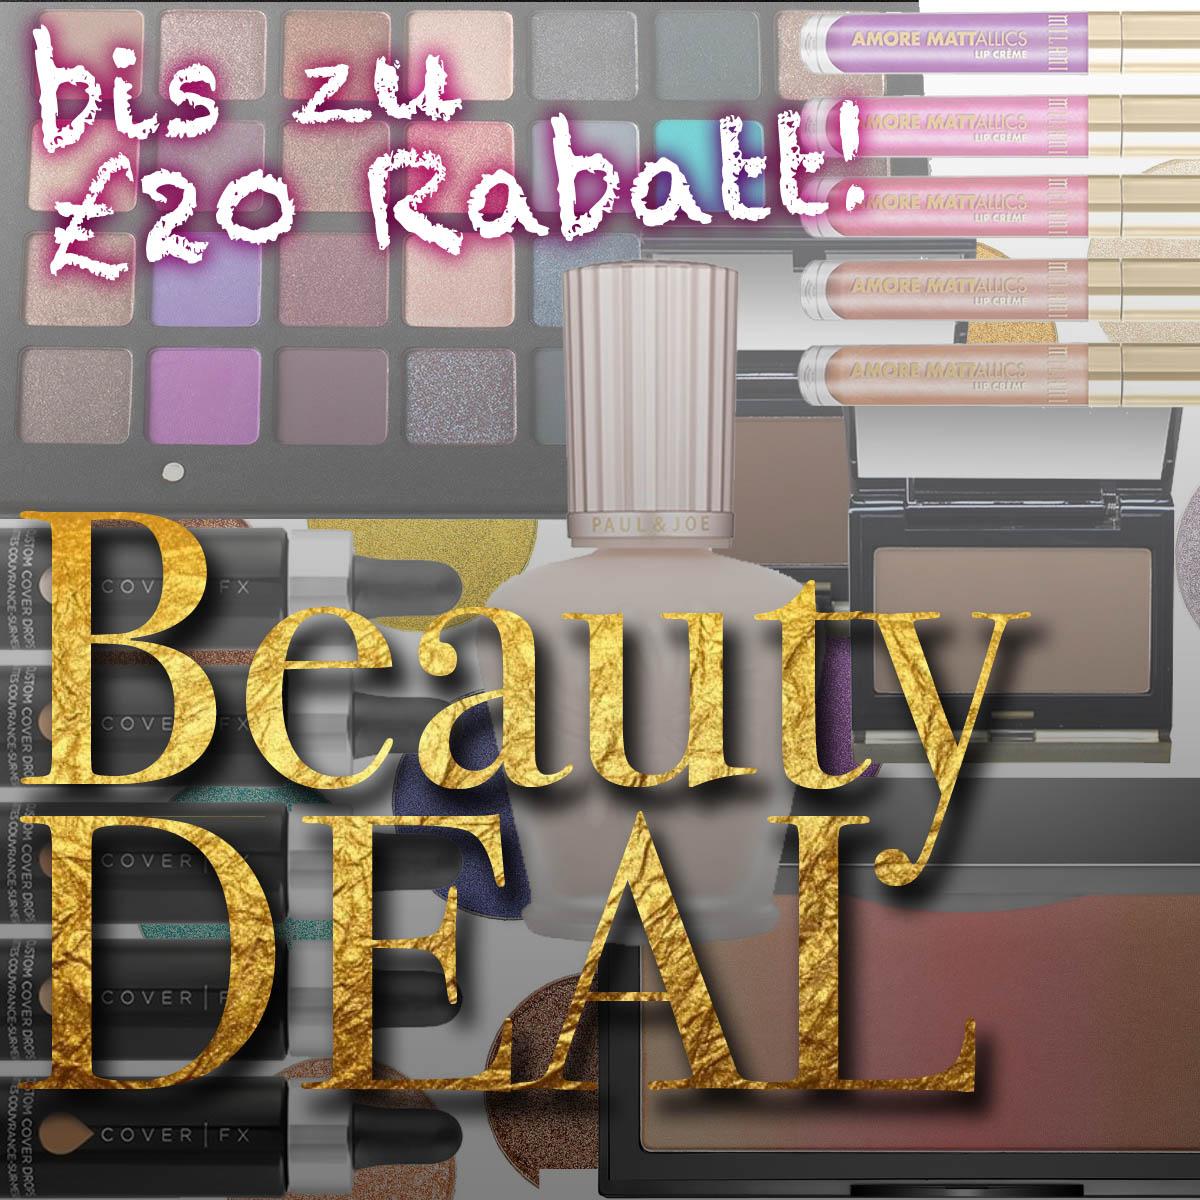 Beauty Deal BeautyBay